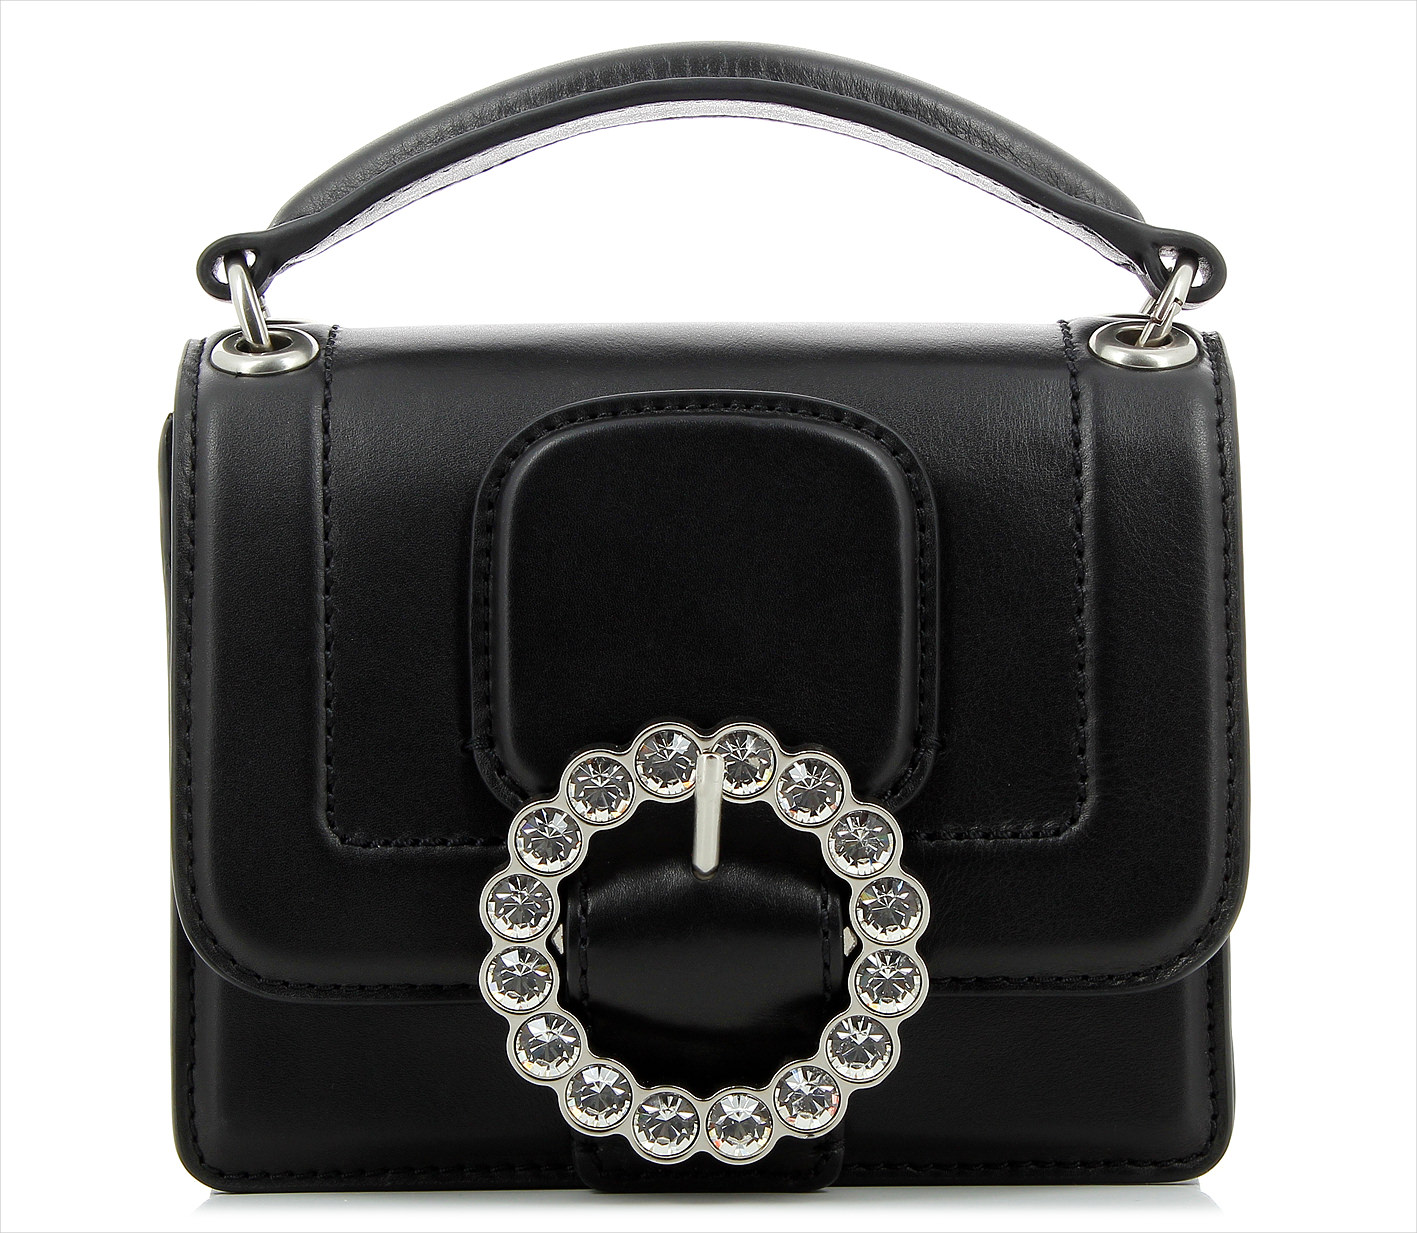 Marc Jacobs Black Box Bag